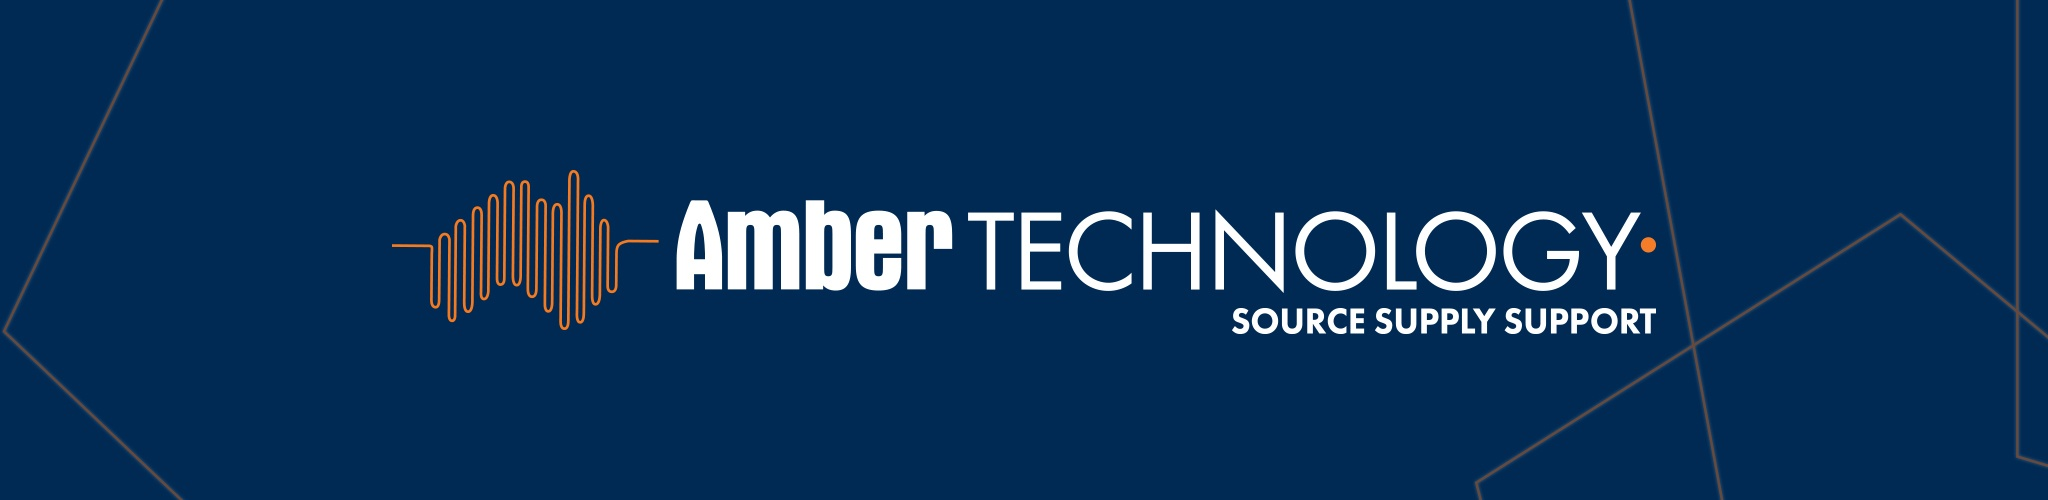 amber_logo.gif